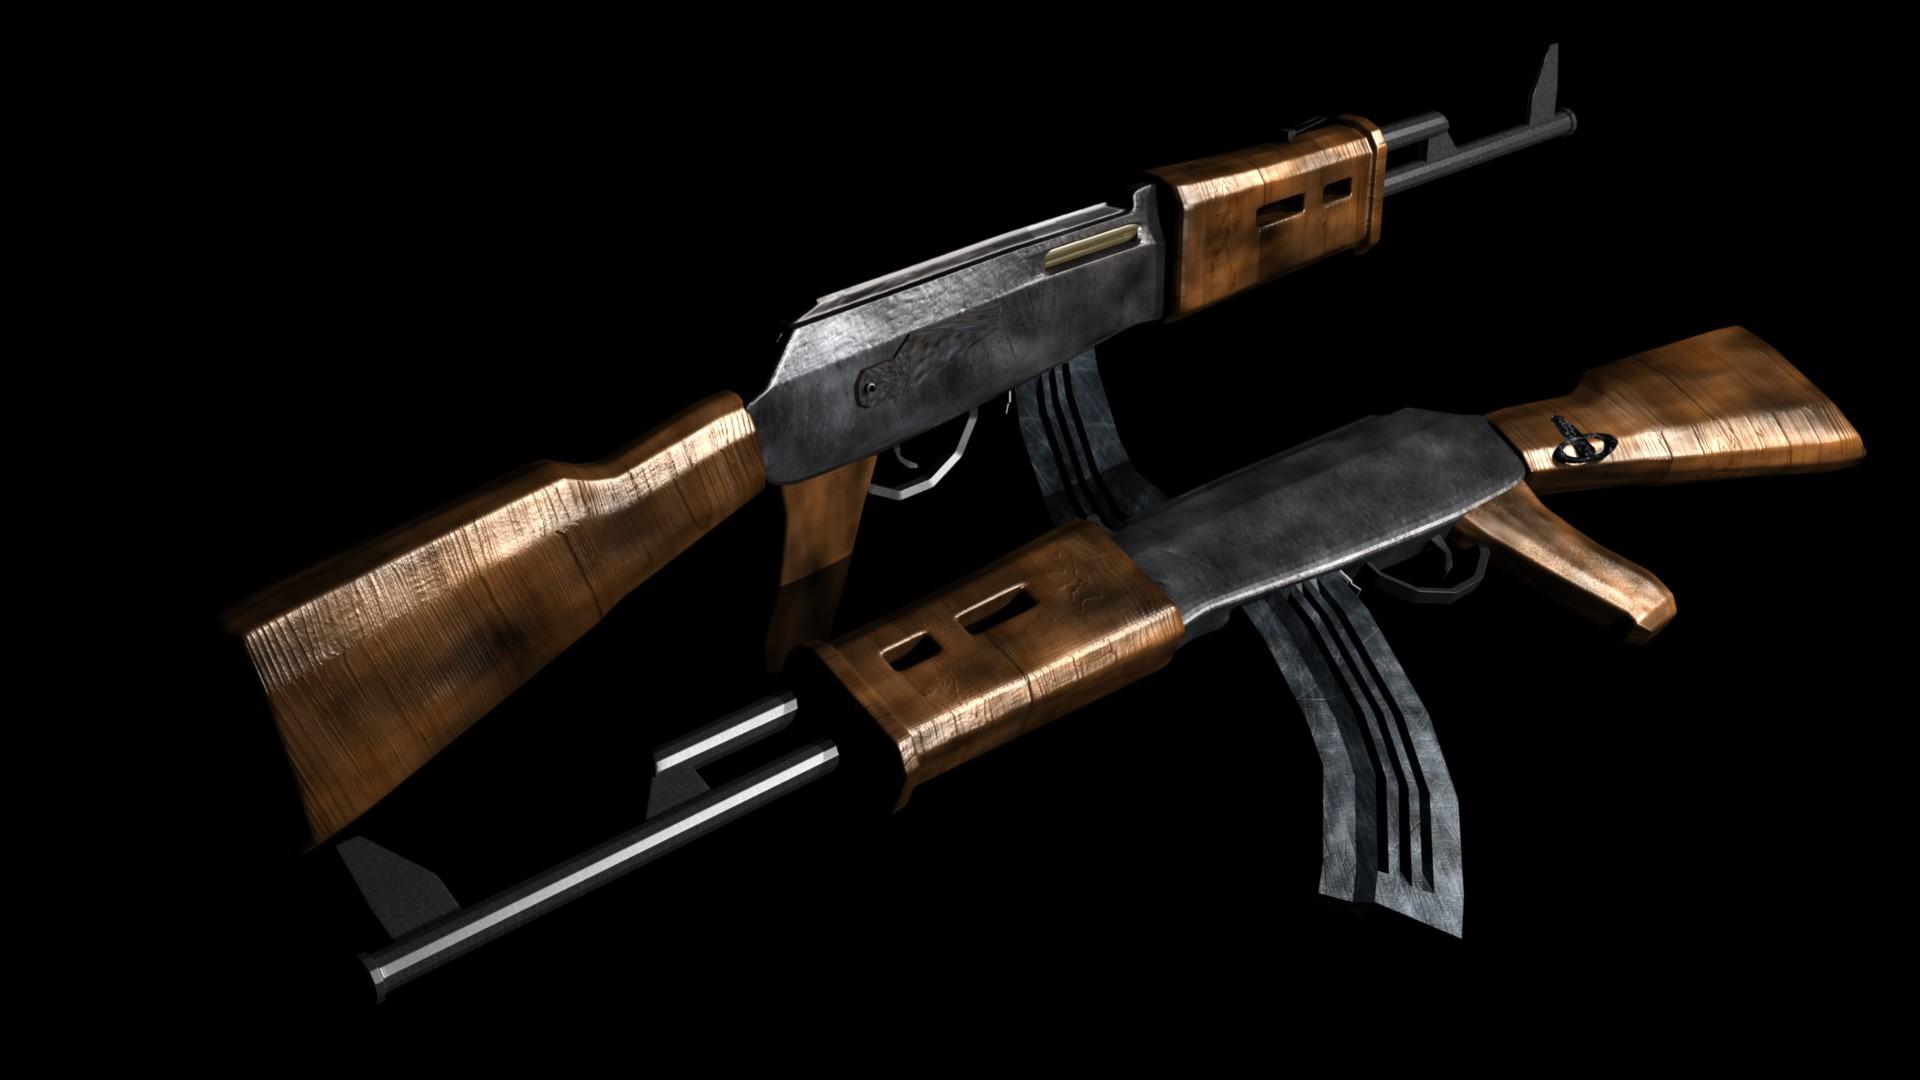 Kalashnikov Wallpapers (74+ background pictures)